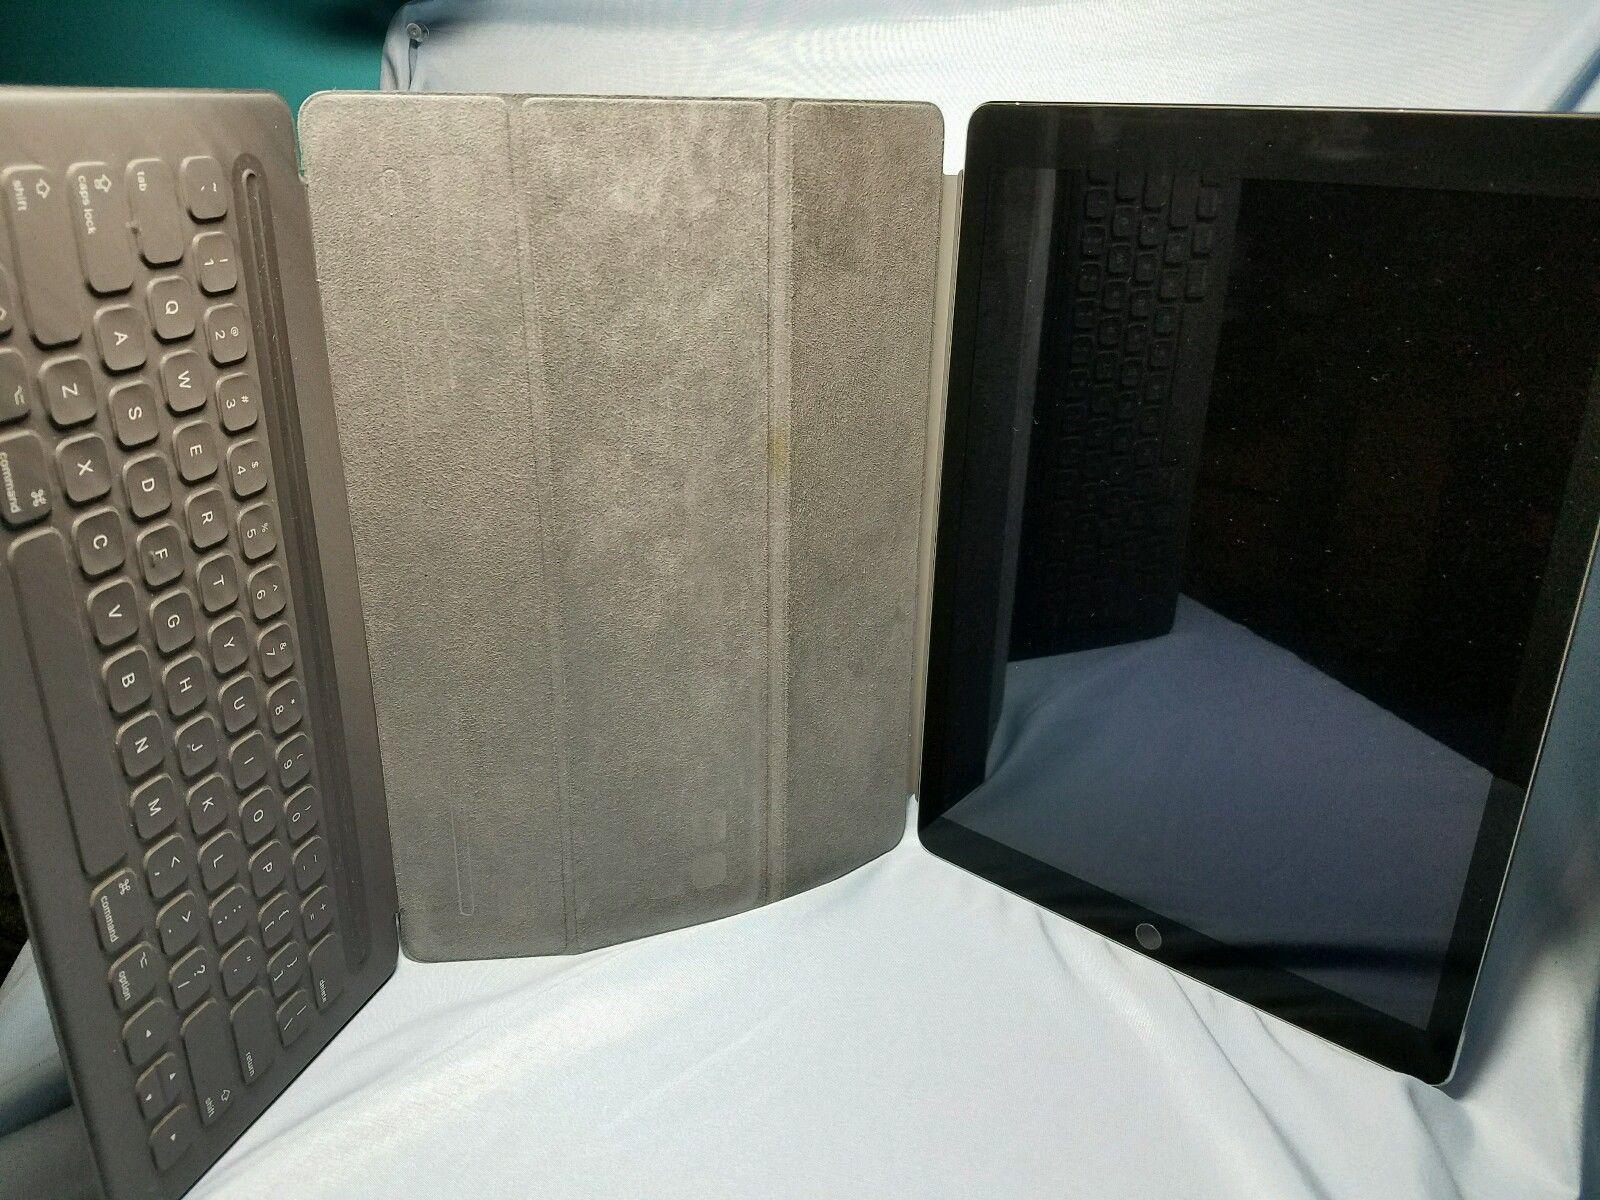 Big Bundle! iPad Pro 12.9 32GB Space Gray WIFI - Smart Cover Keyboard! $1195.00 https://t.co/DBeEYi1bhm https://t.co/irPQ3b1WO5